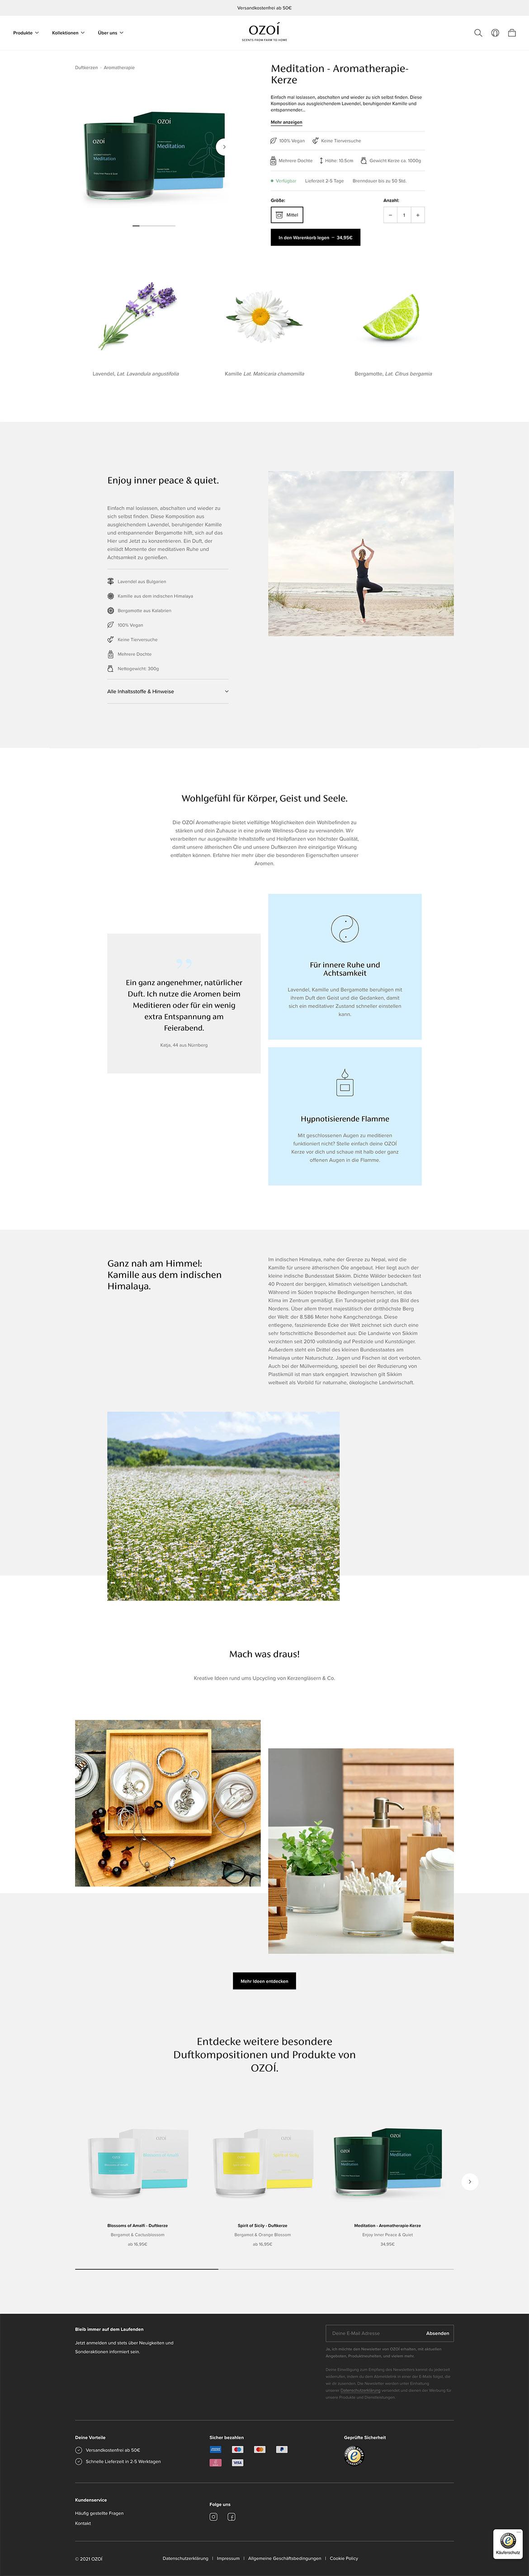 210701_ozoi_produkt_02